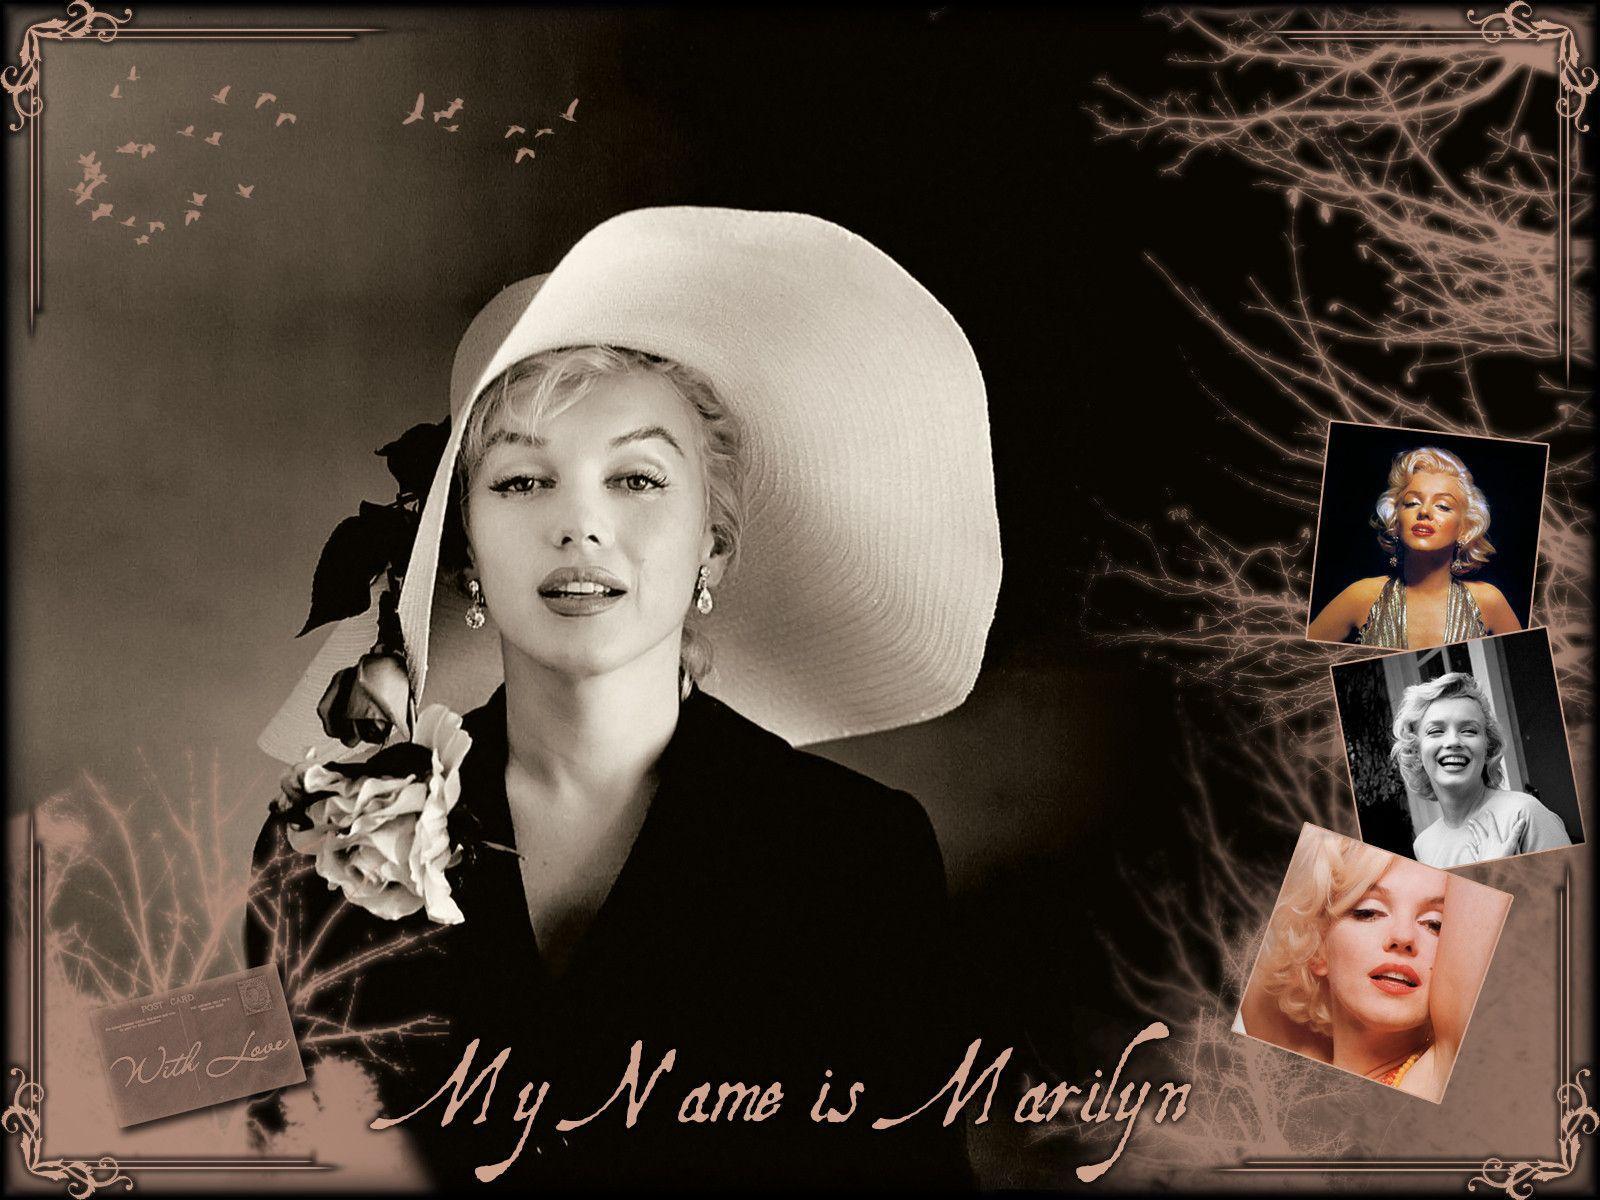 Marilyn Monroe Wallpapers - HD Wallpapers Inn